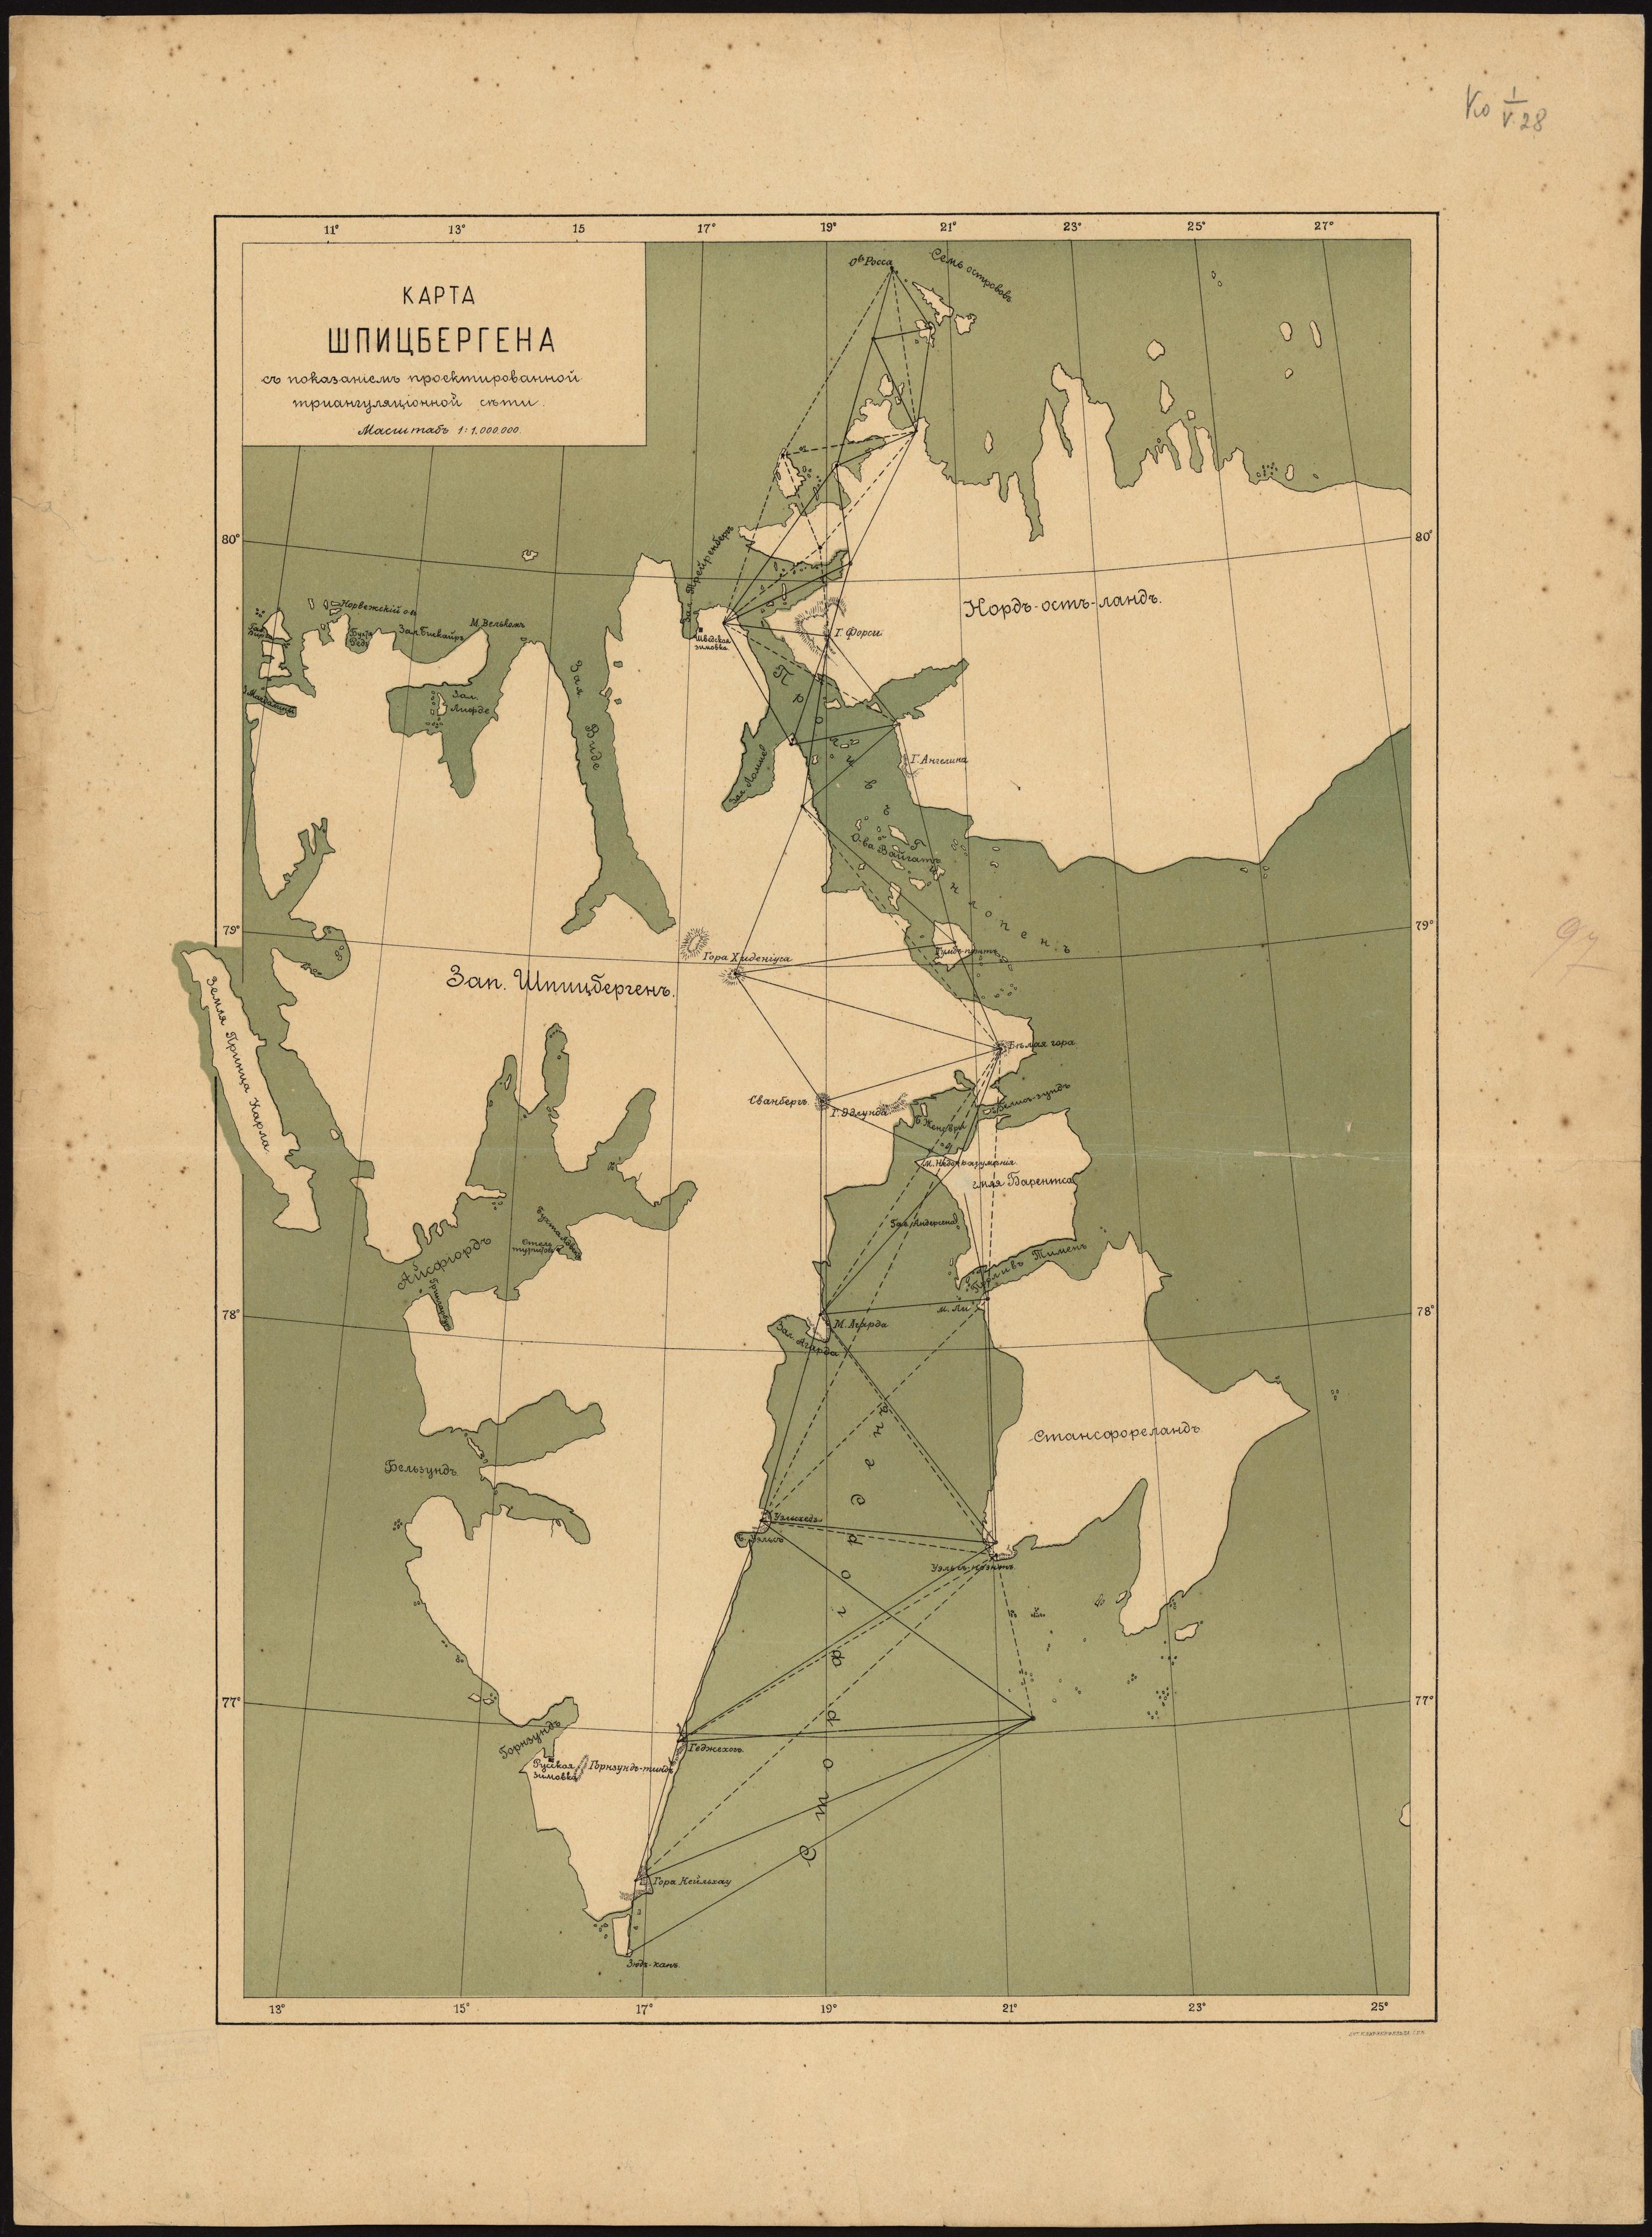 1898-1901. Шпицберген. Карта составлена по съемкам русско-шведской экспедиции для градусного измерения на Шпицбергене с участием А. С. Васильева